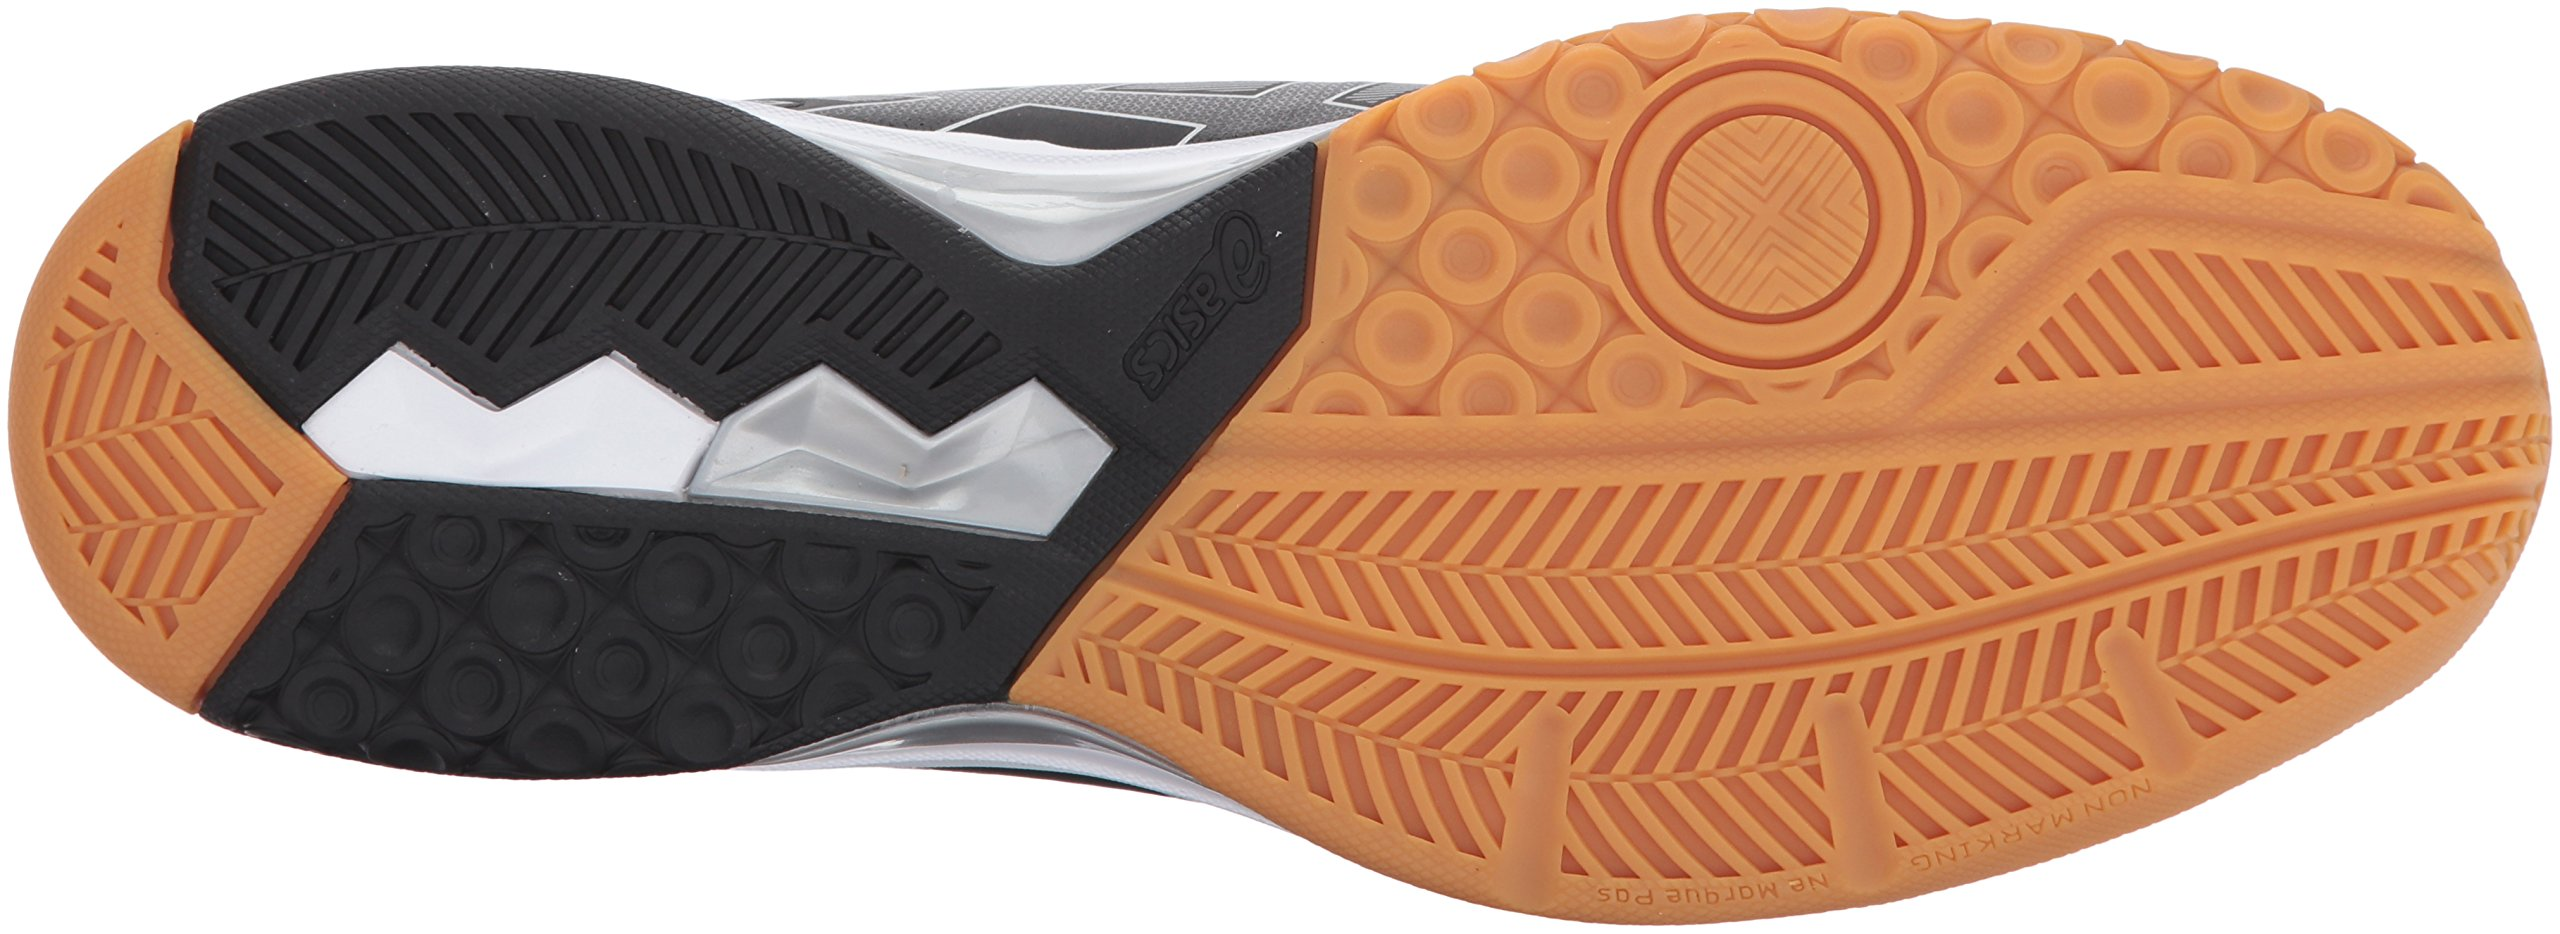 ASICS Mens Gel-Rocket 8 Volleyball Shoe Black/White, 7 Medium US by ASICS (Image #3)